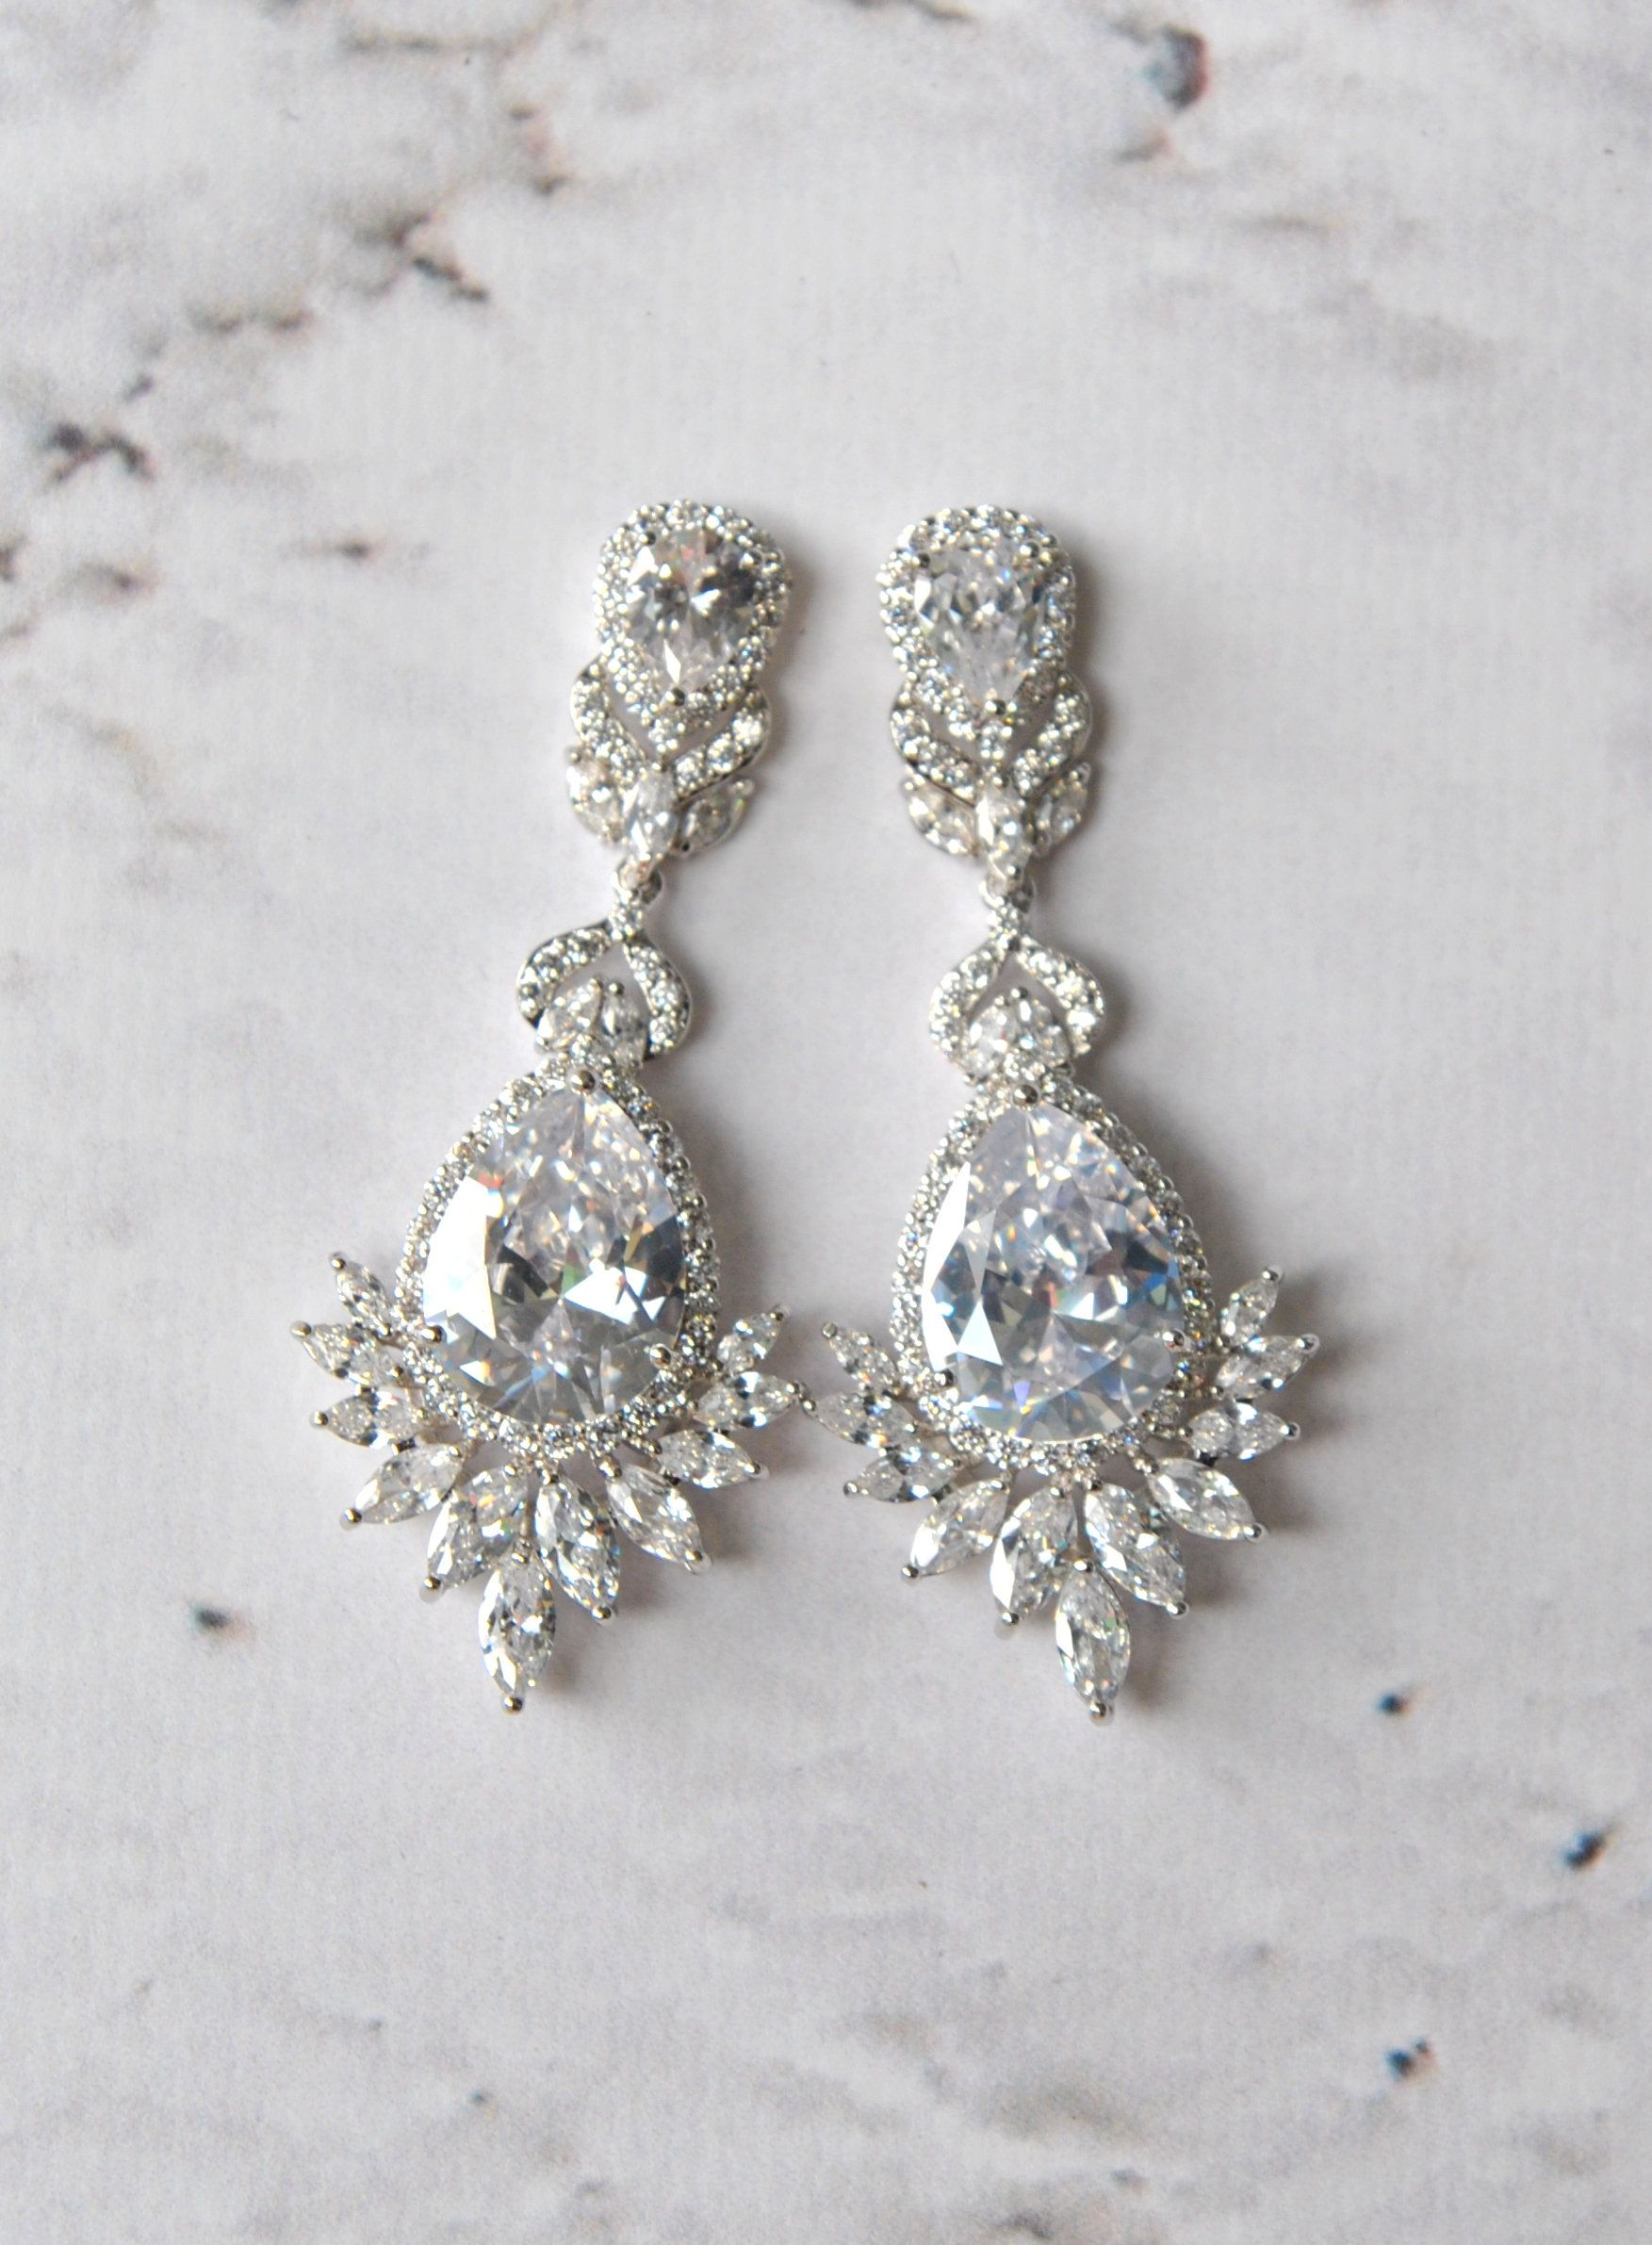 d43ccf49ad1a2 LAUREN Bridal Earrings, crystal Wedding earrings, Swarovski earrings ...